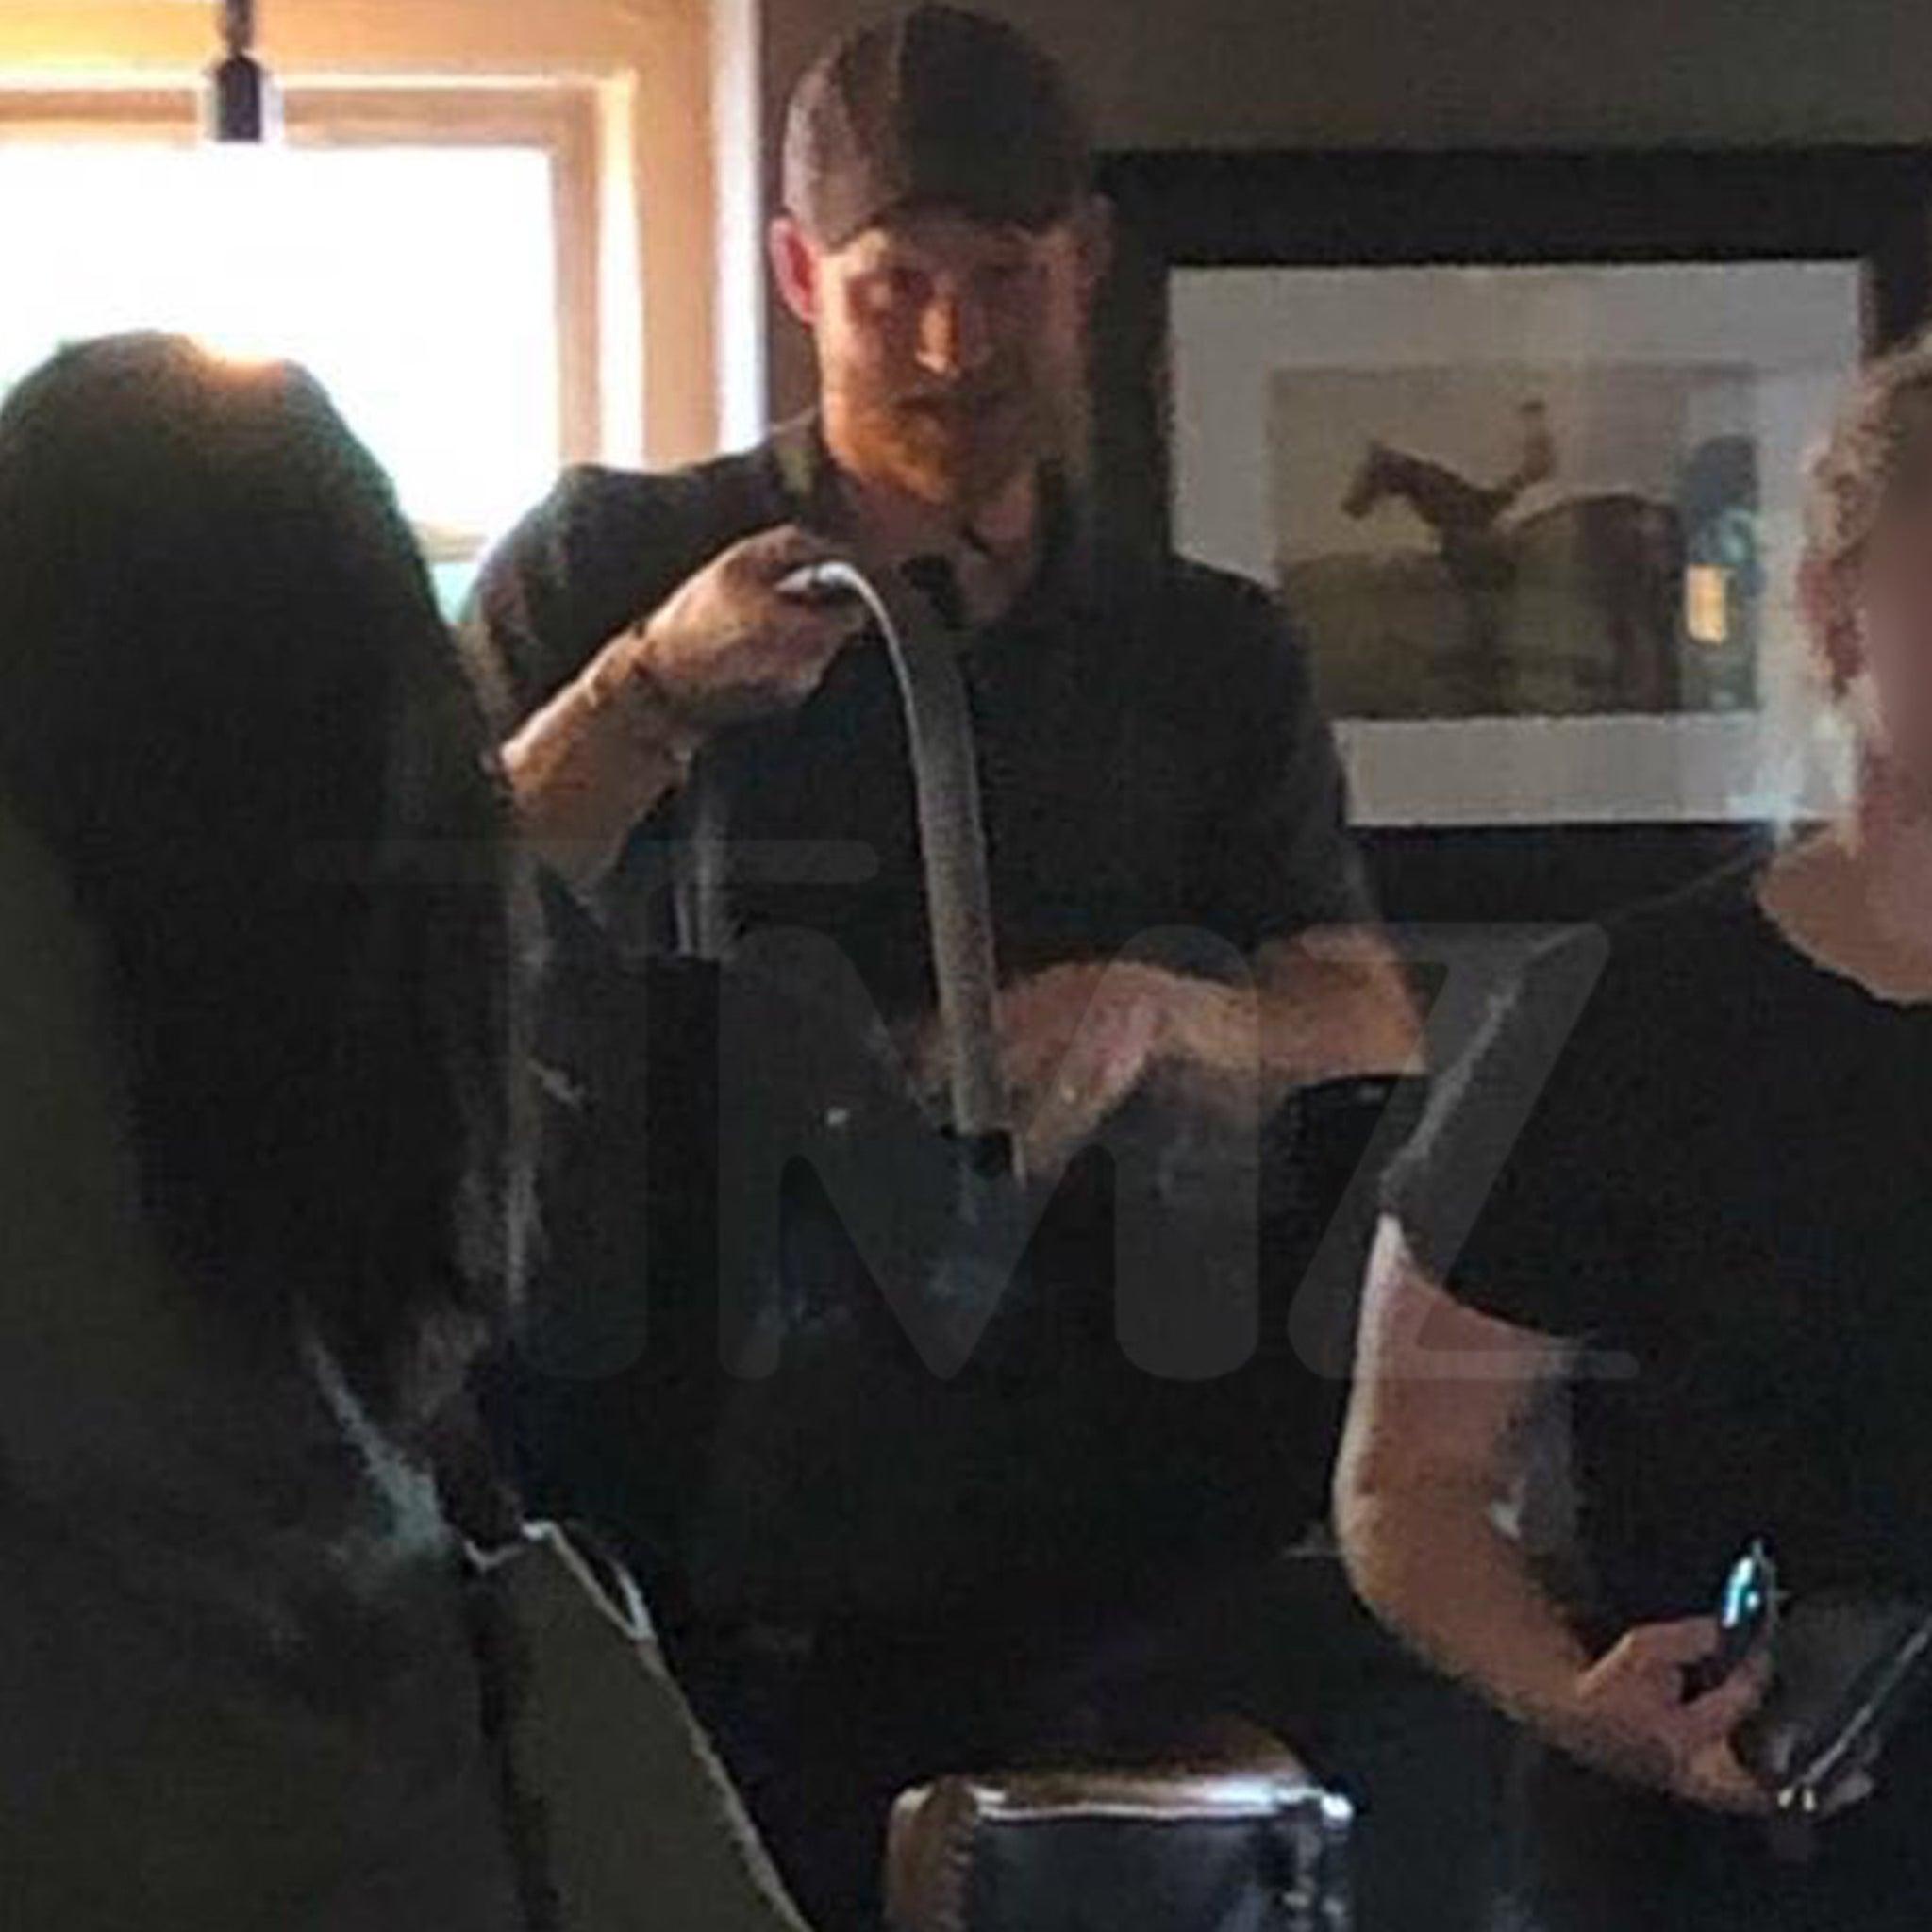 Prince Harry & Meghan Markle Take Archie Out to a Pub